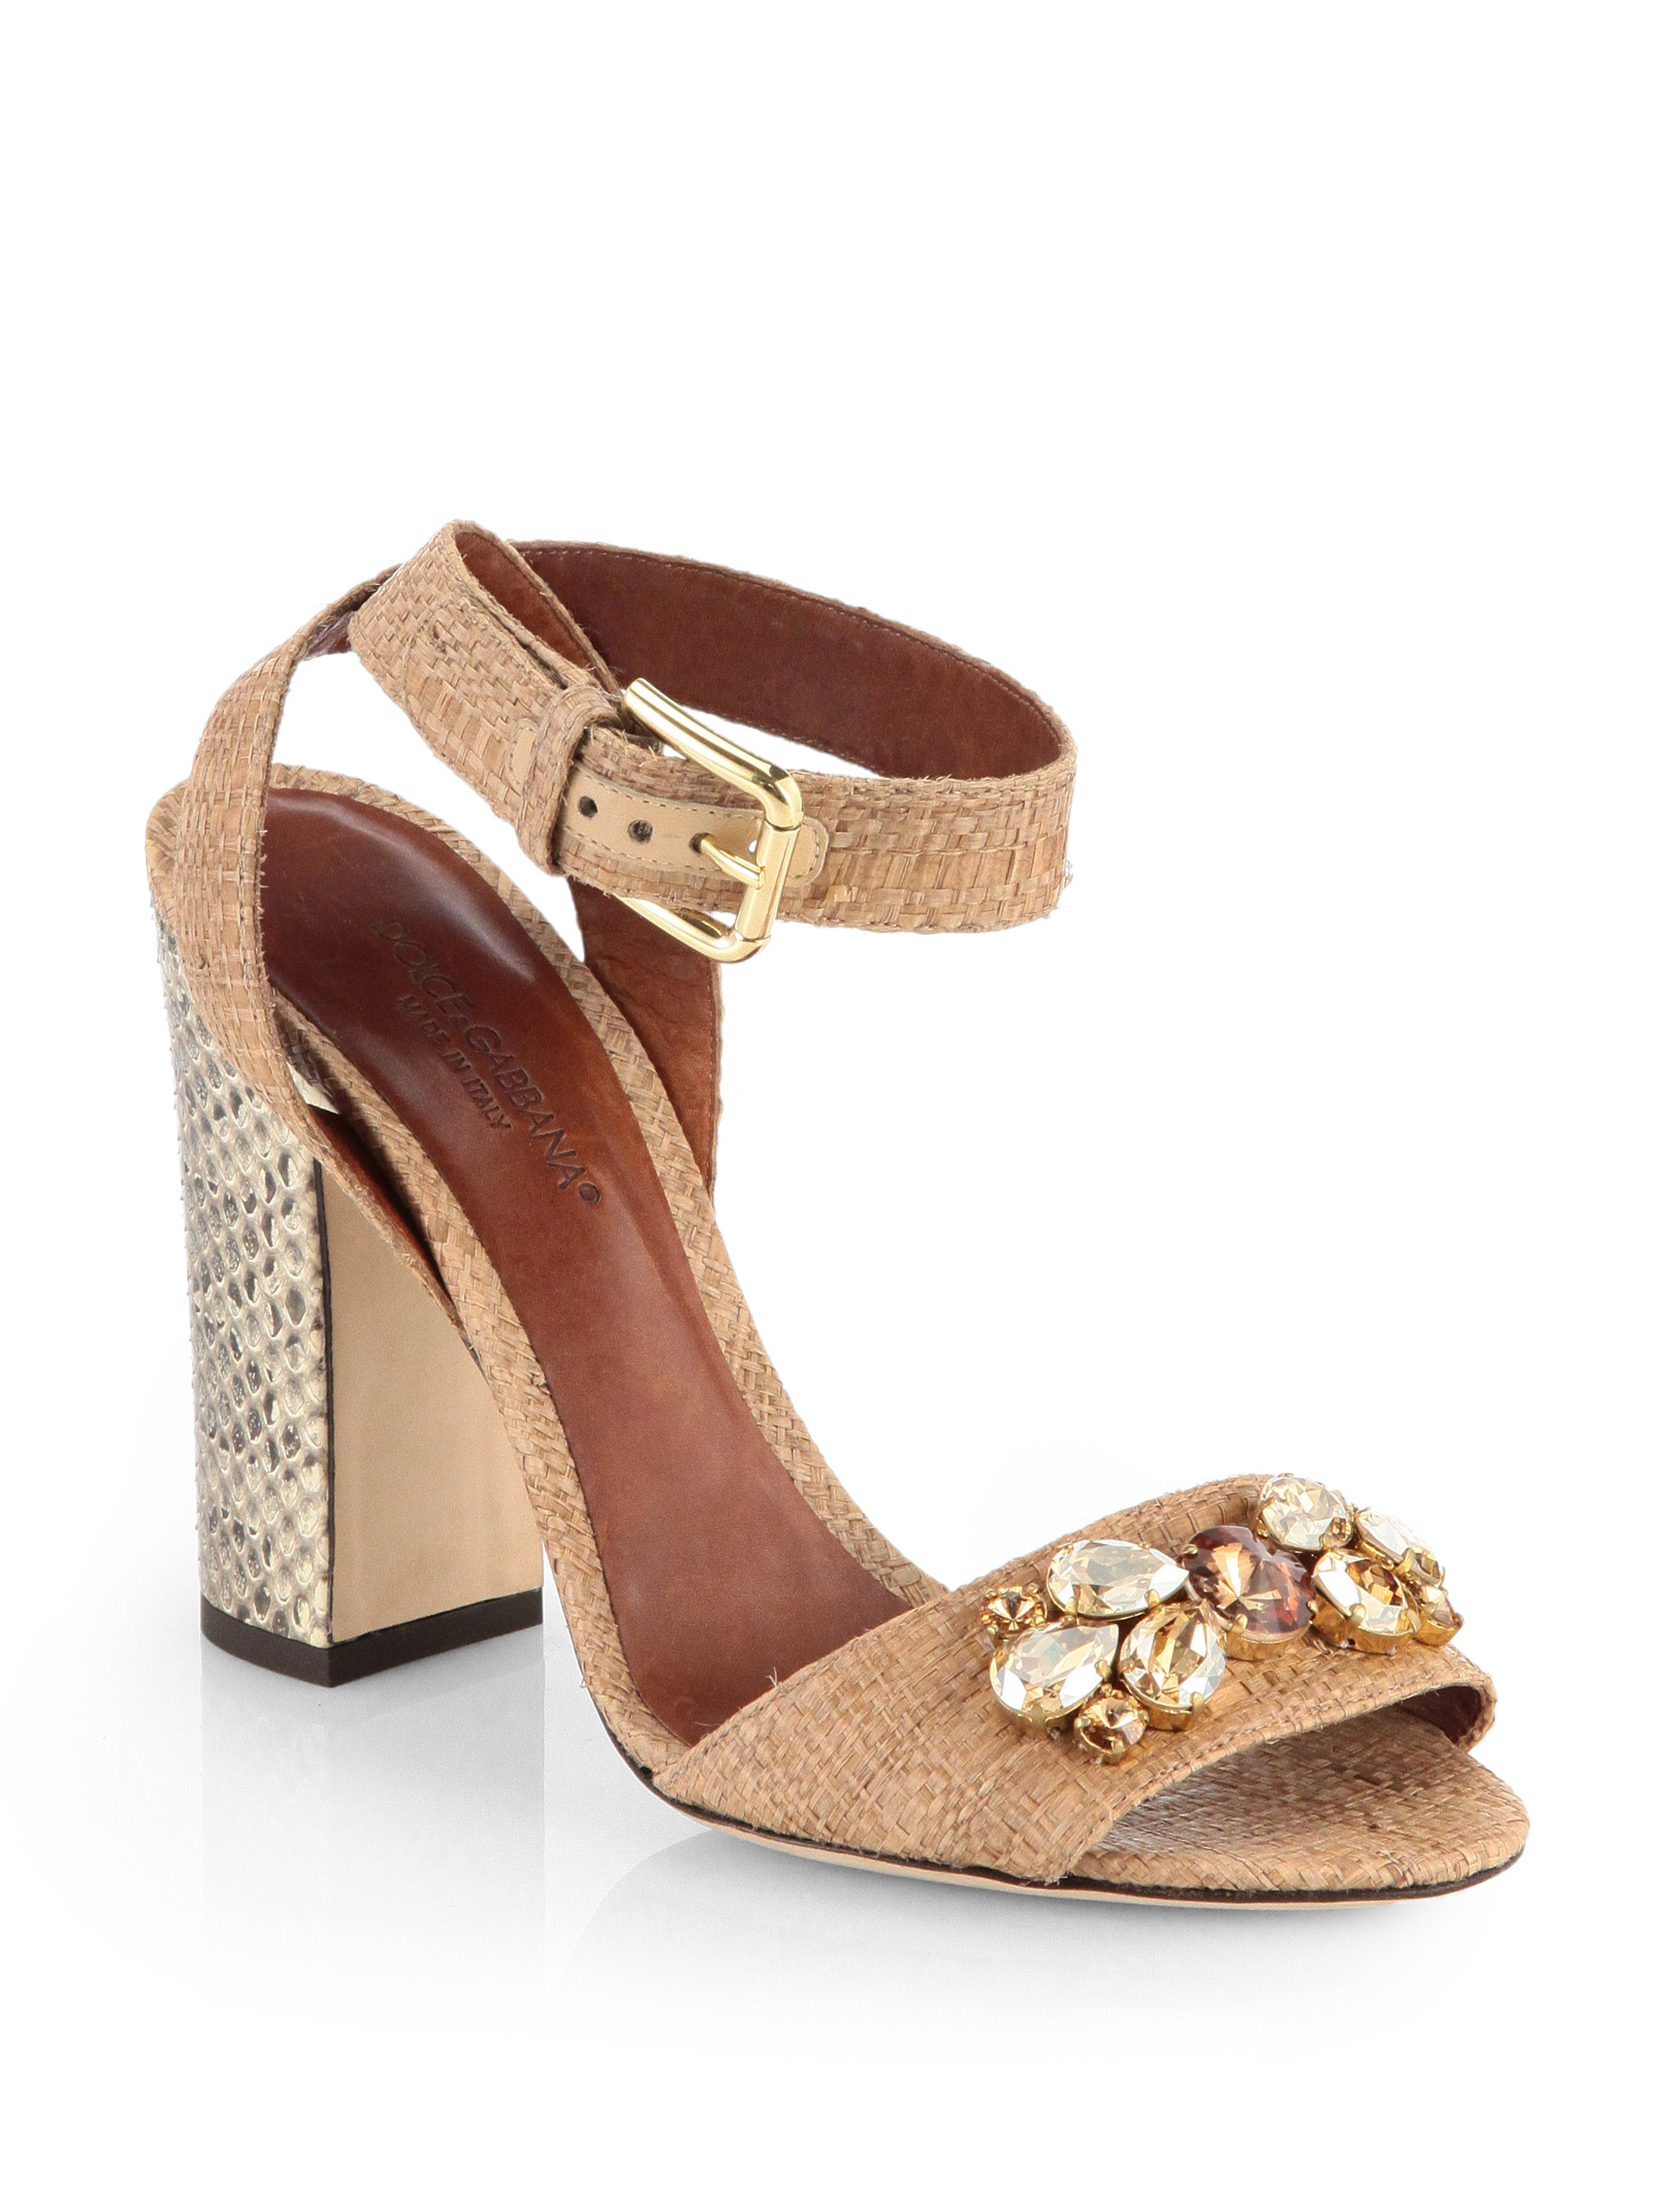 Dolce & Gabbana Bejeweled heel platform sandals 7JGGTAGQ